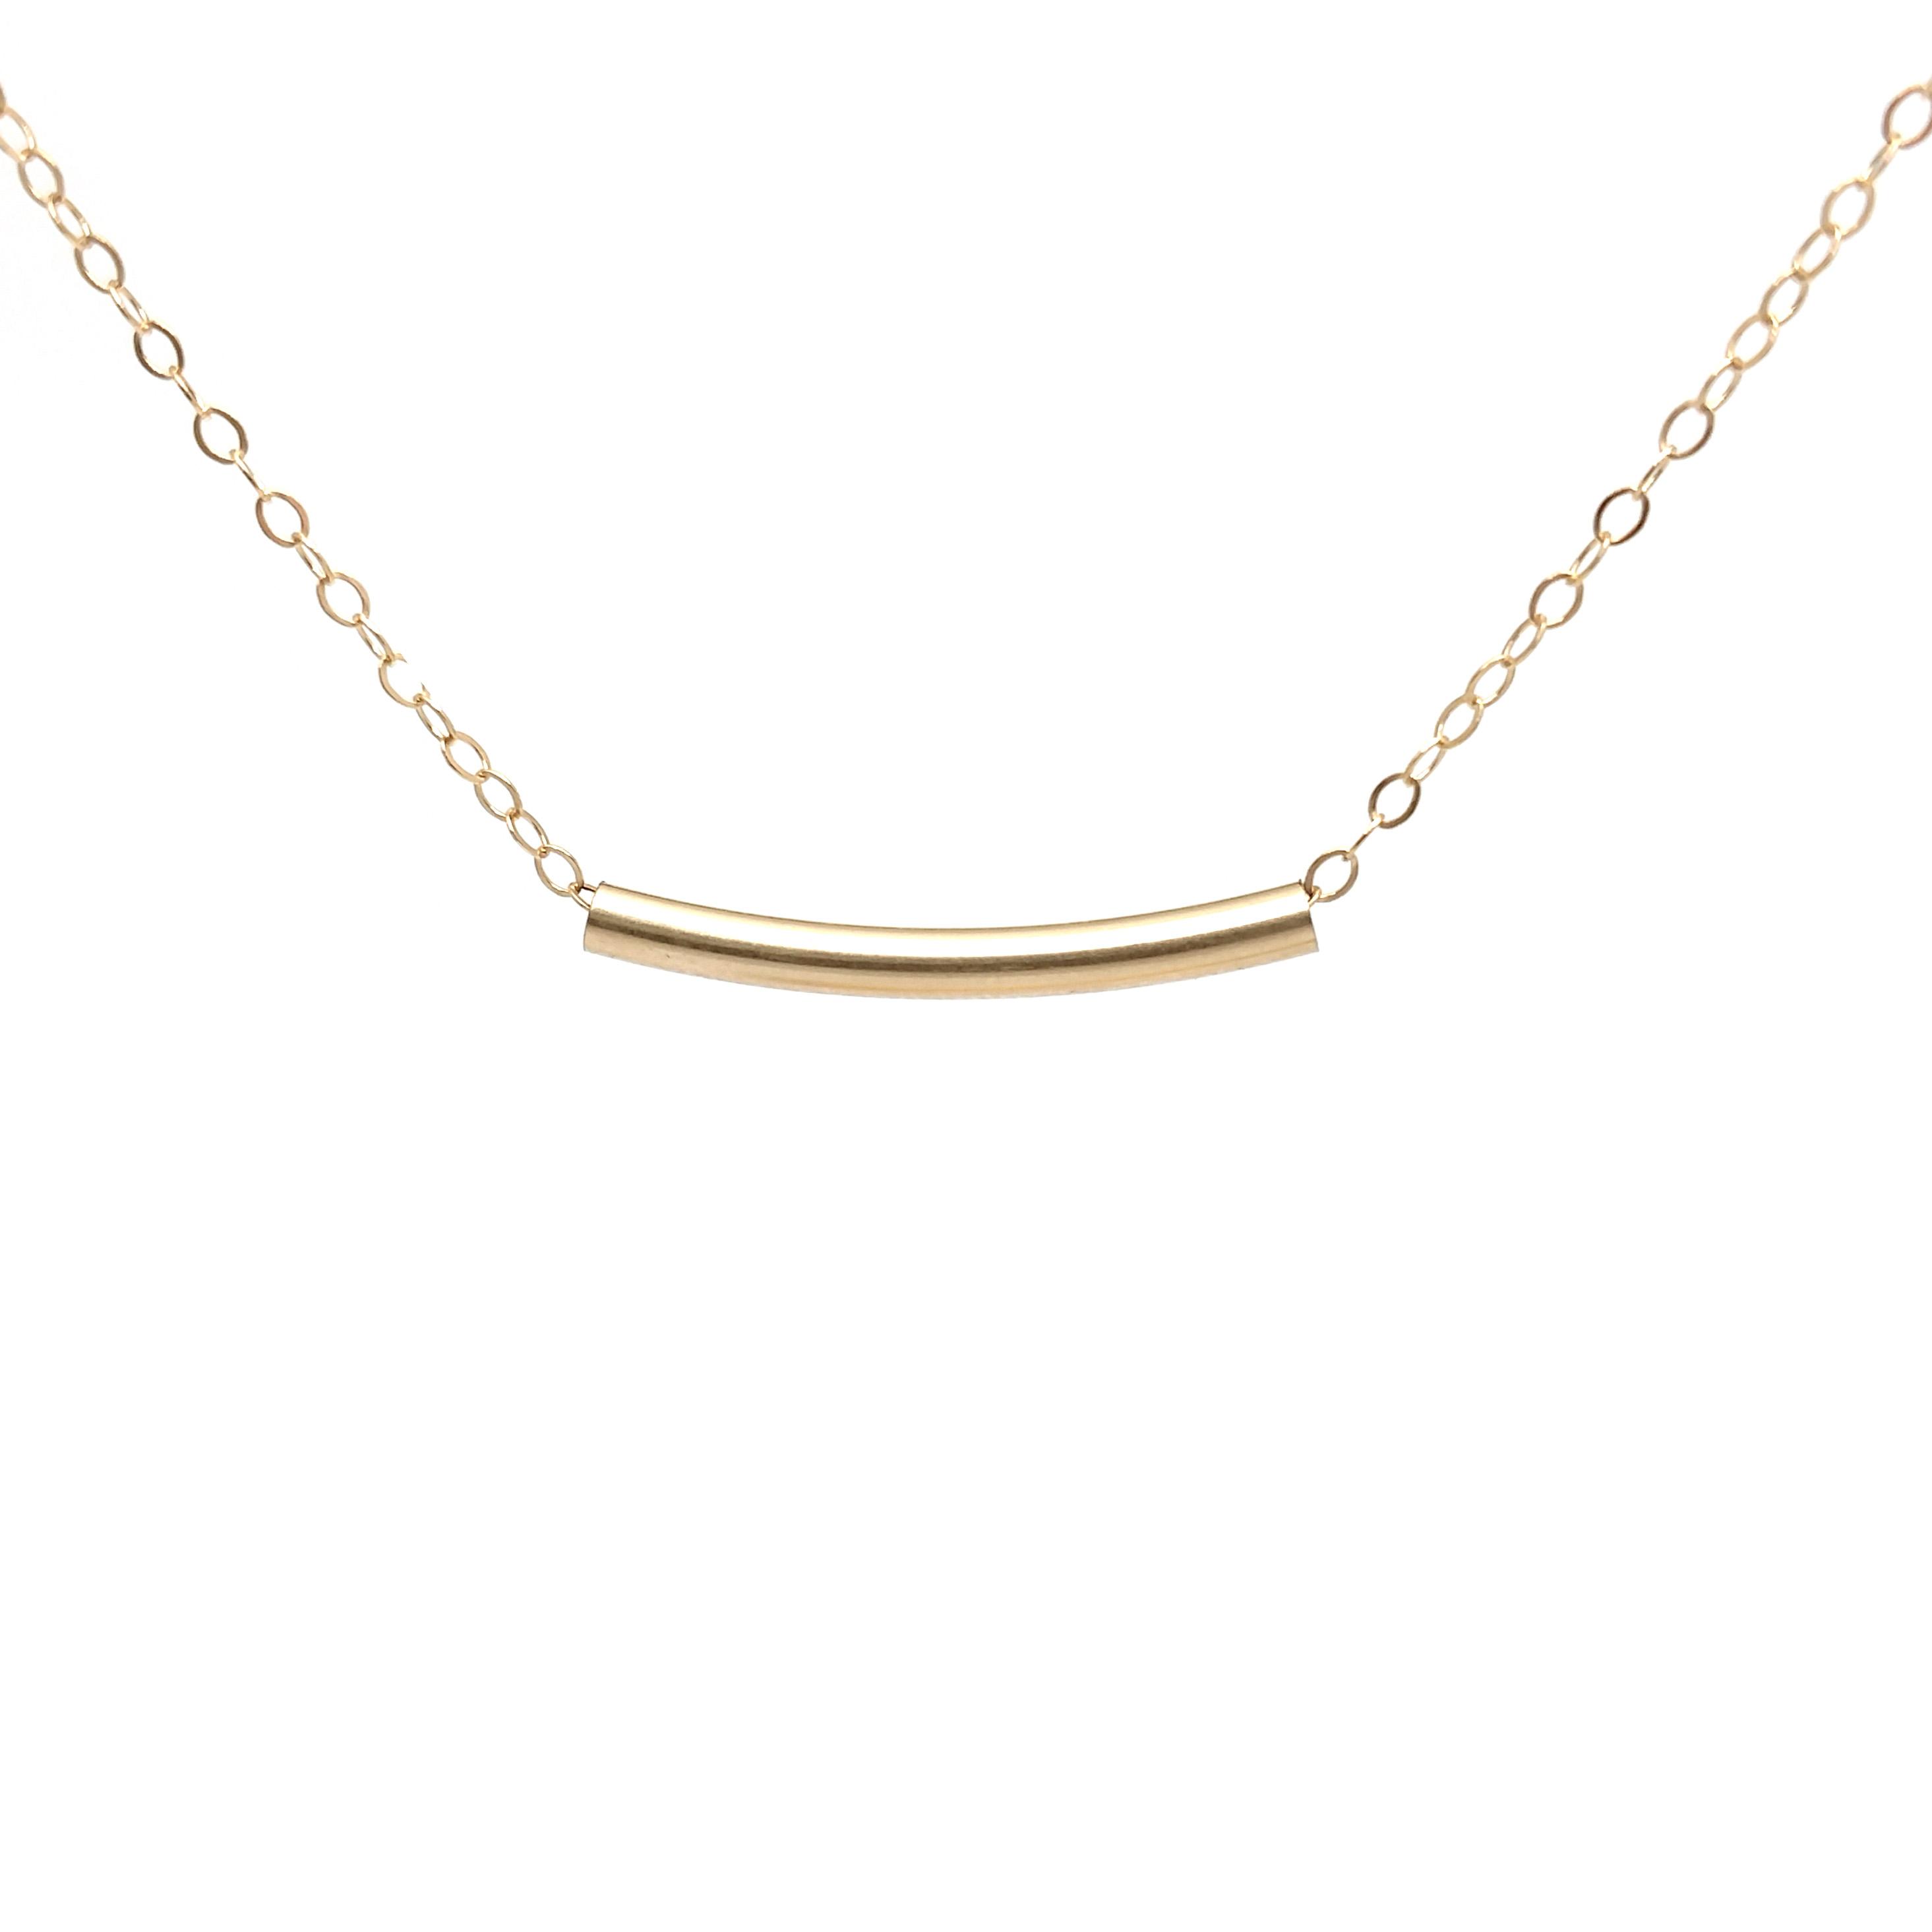 Sliding 14k gold filled layering necklace soasa designs aloadofball Choice Image